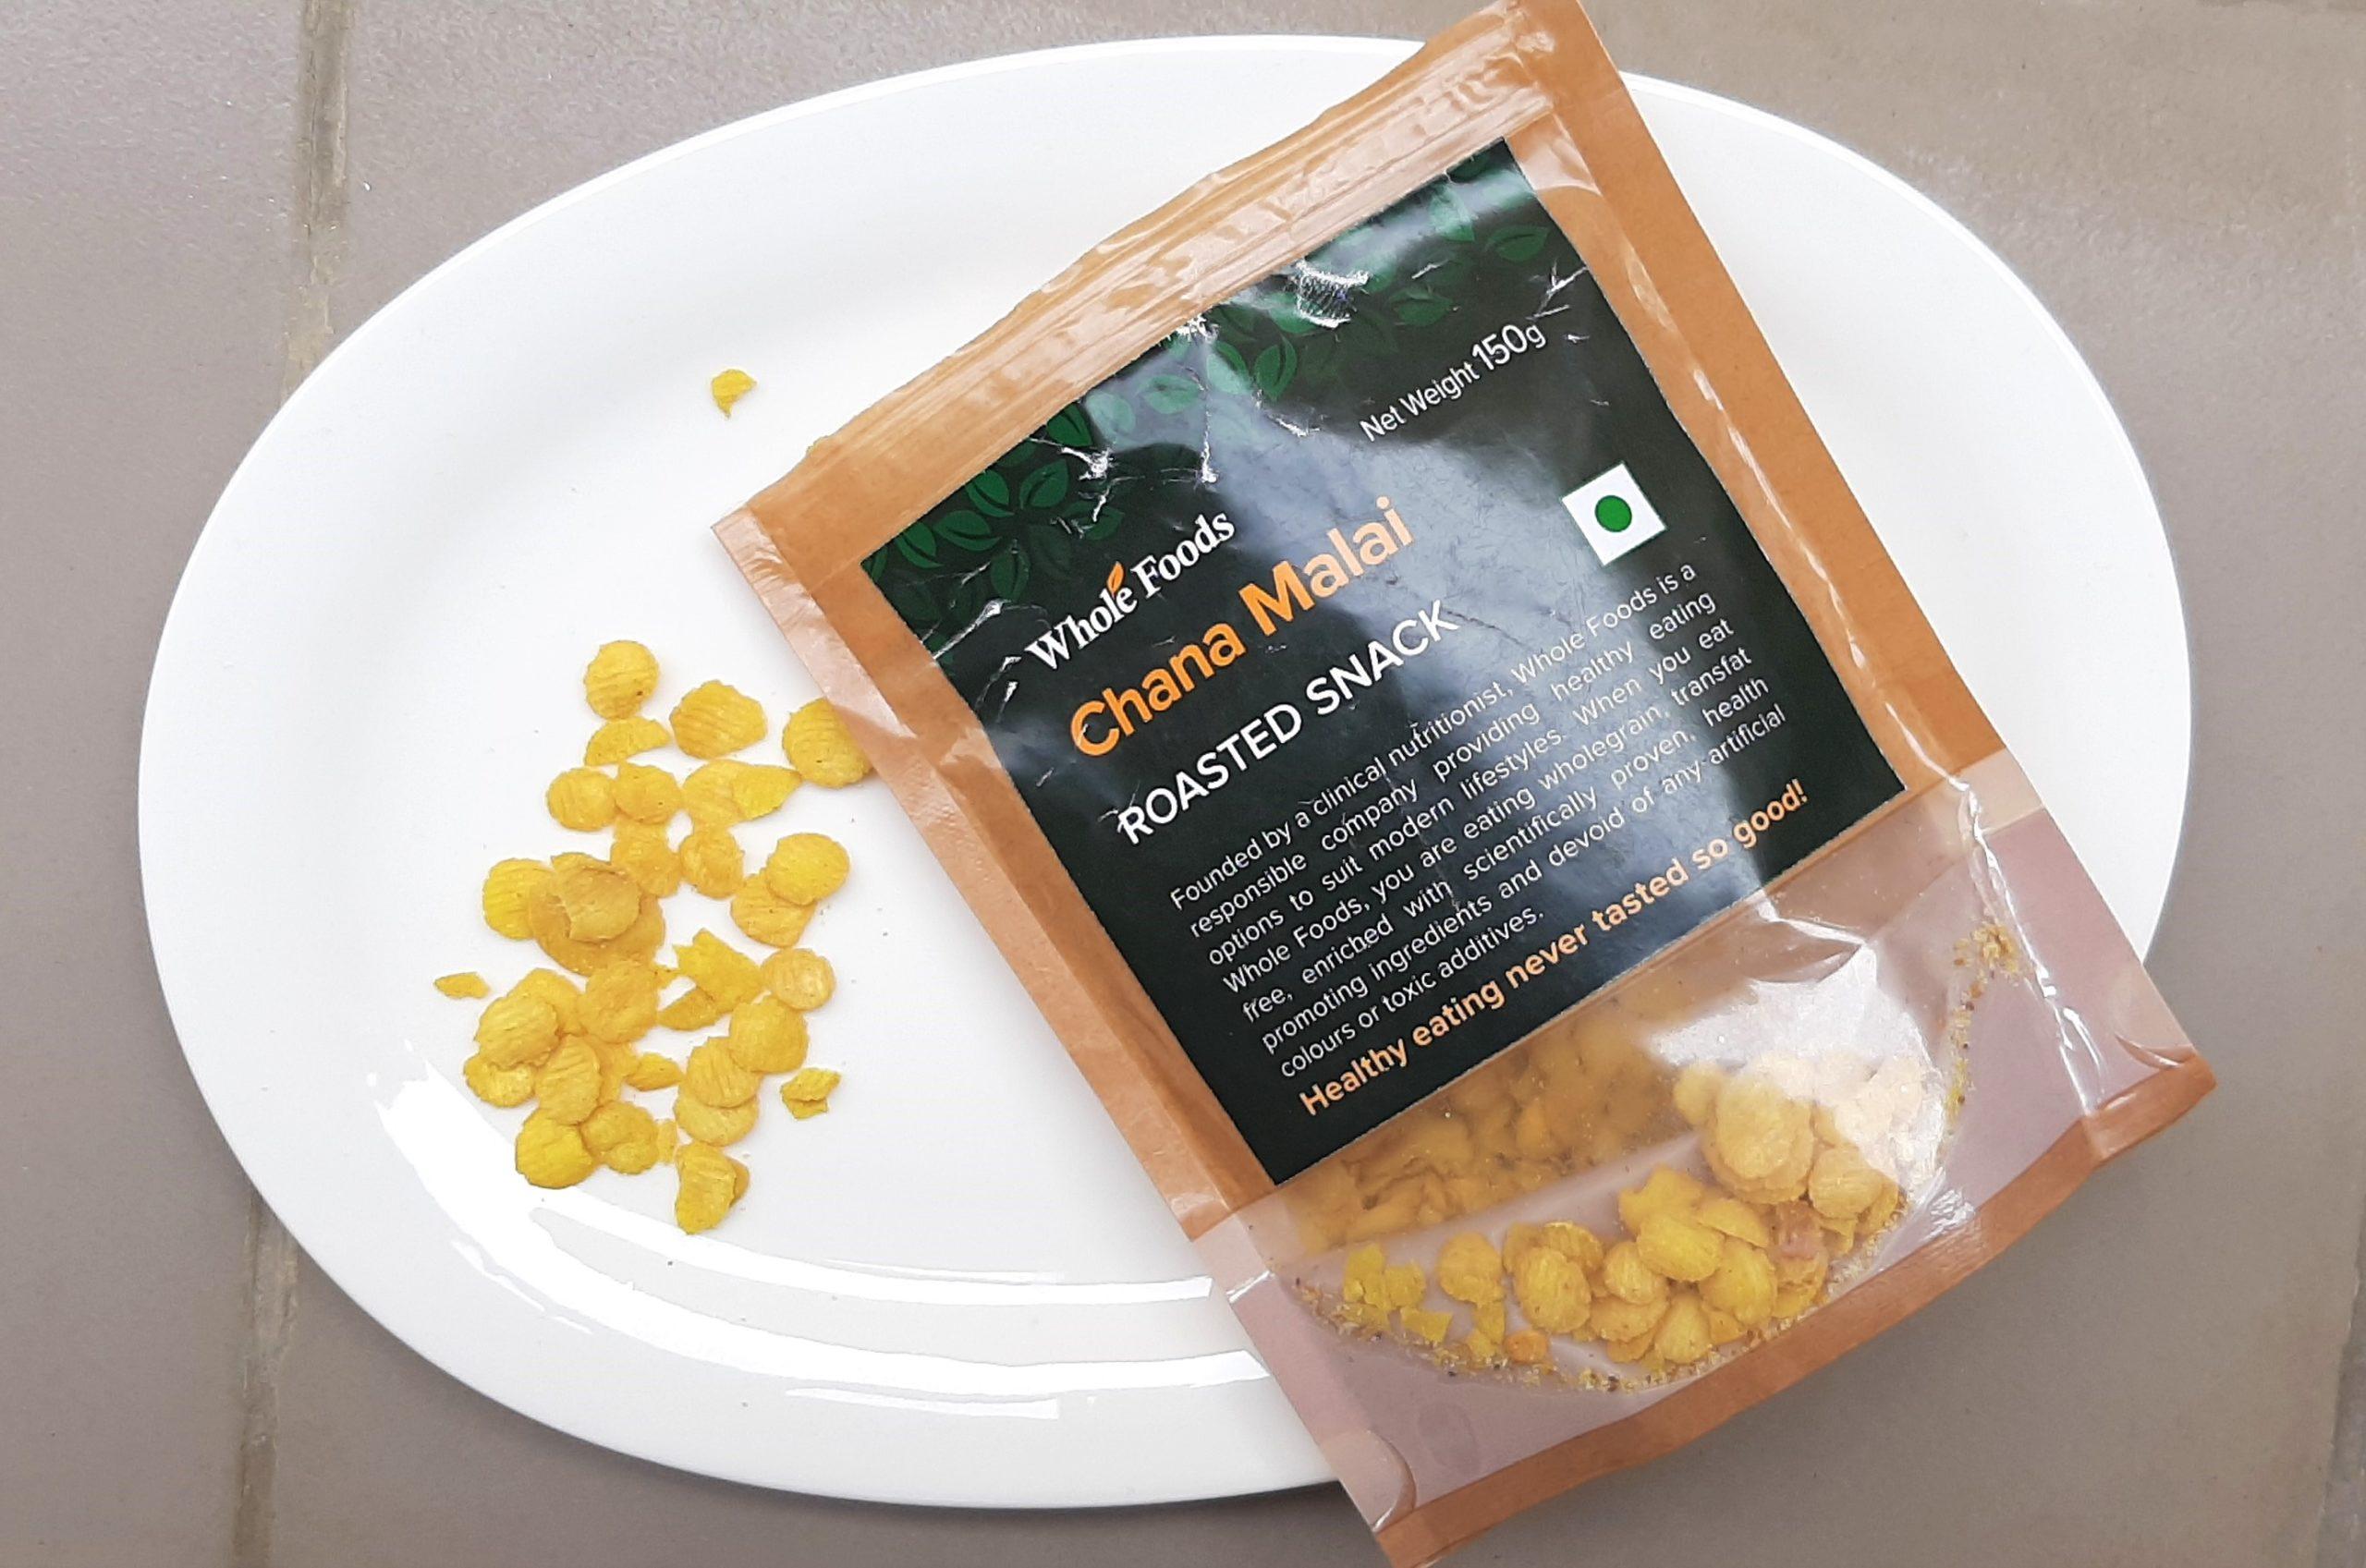 Whole Foods Chana Malai Roasted Snack-mishry